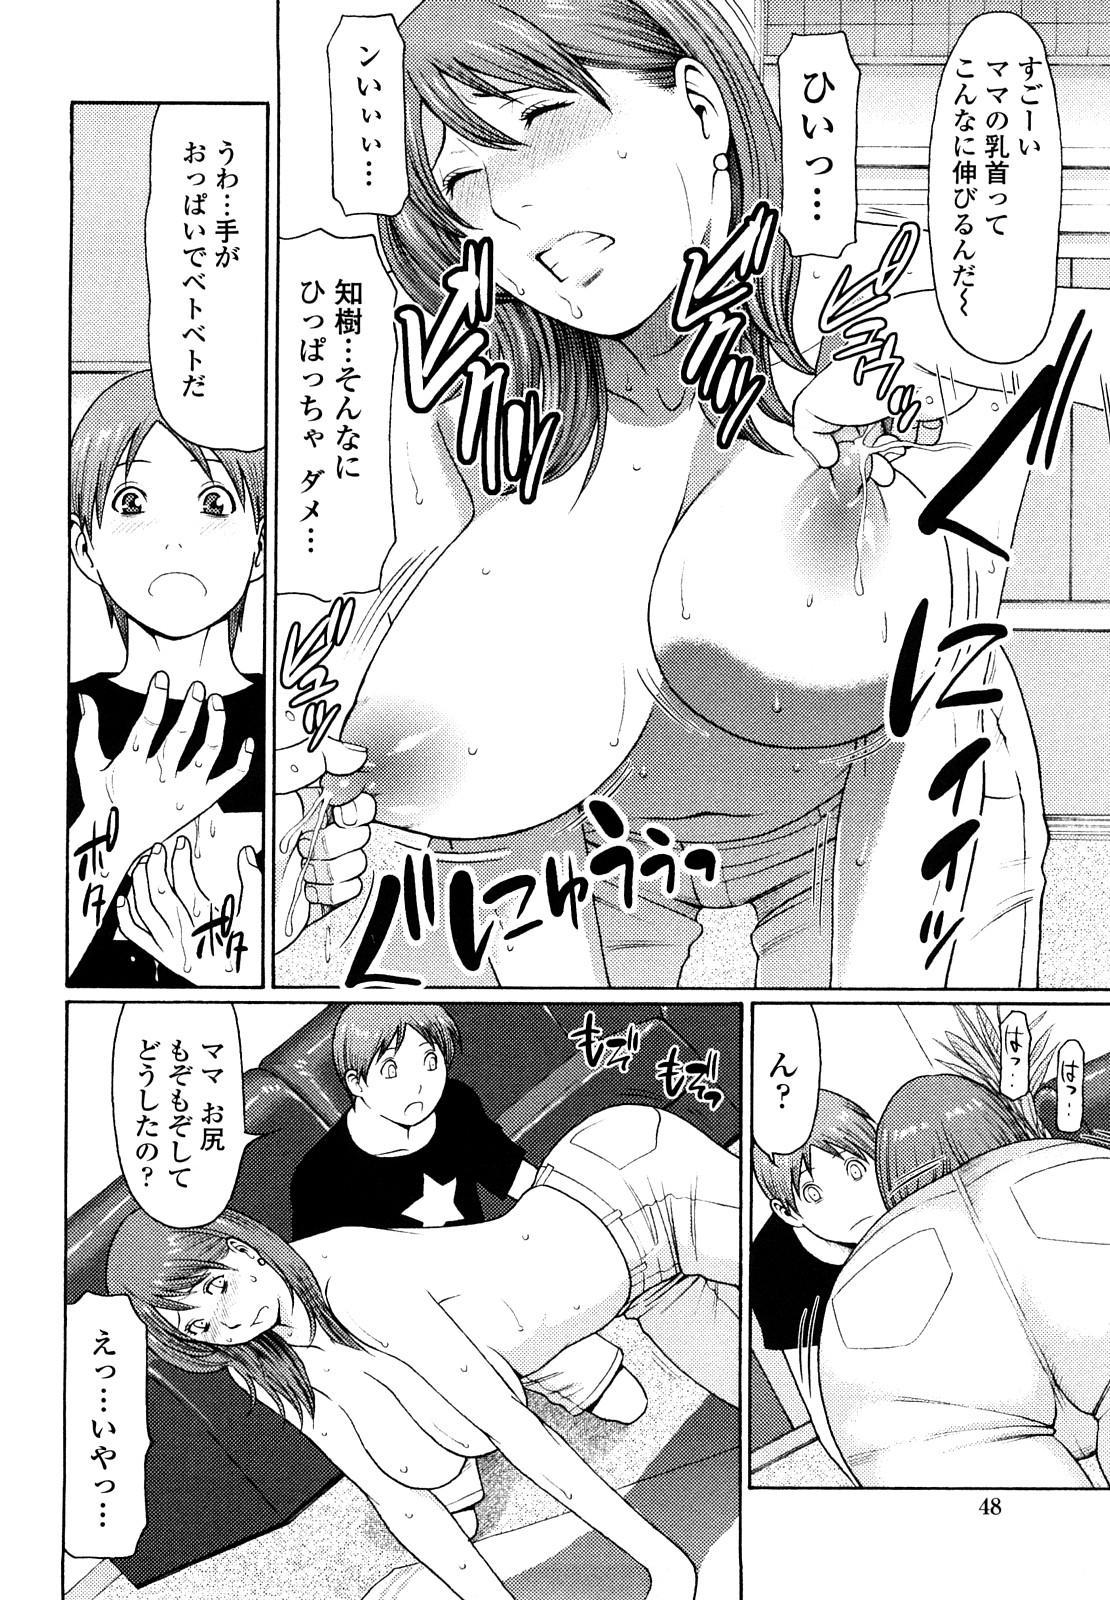 [Takasugi Kou] Kindan no Haha-Ana - Immorality Love-Hole [Decensored] 49